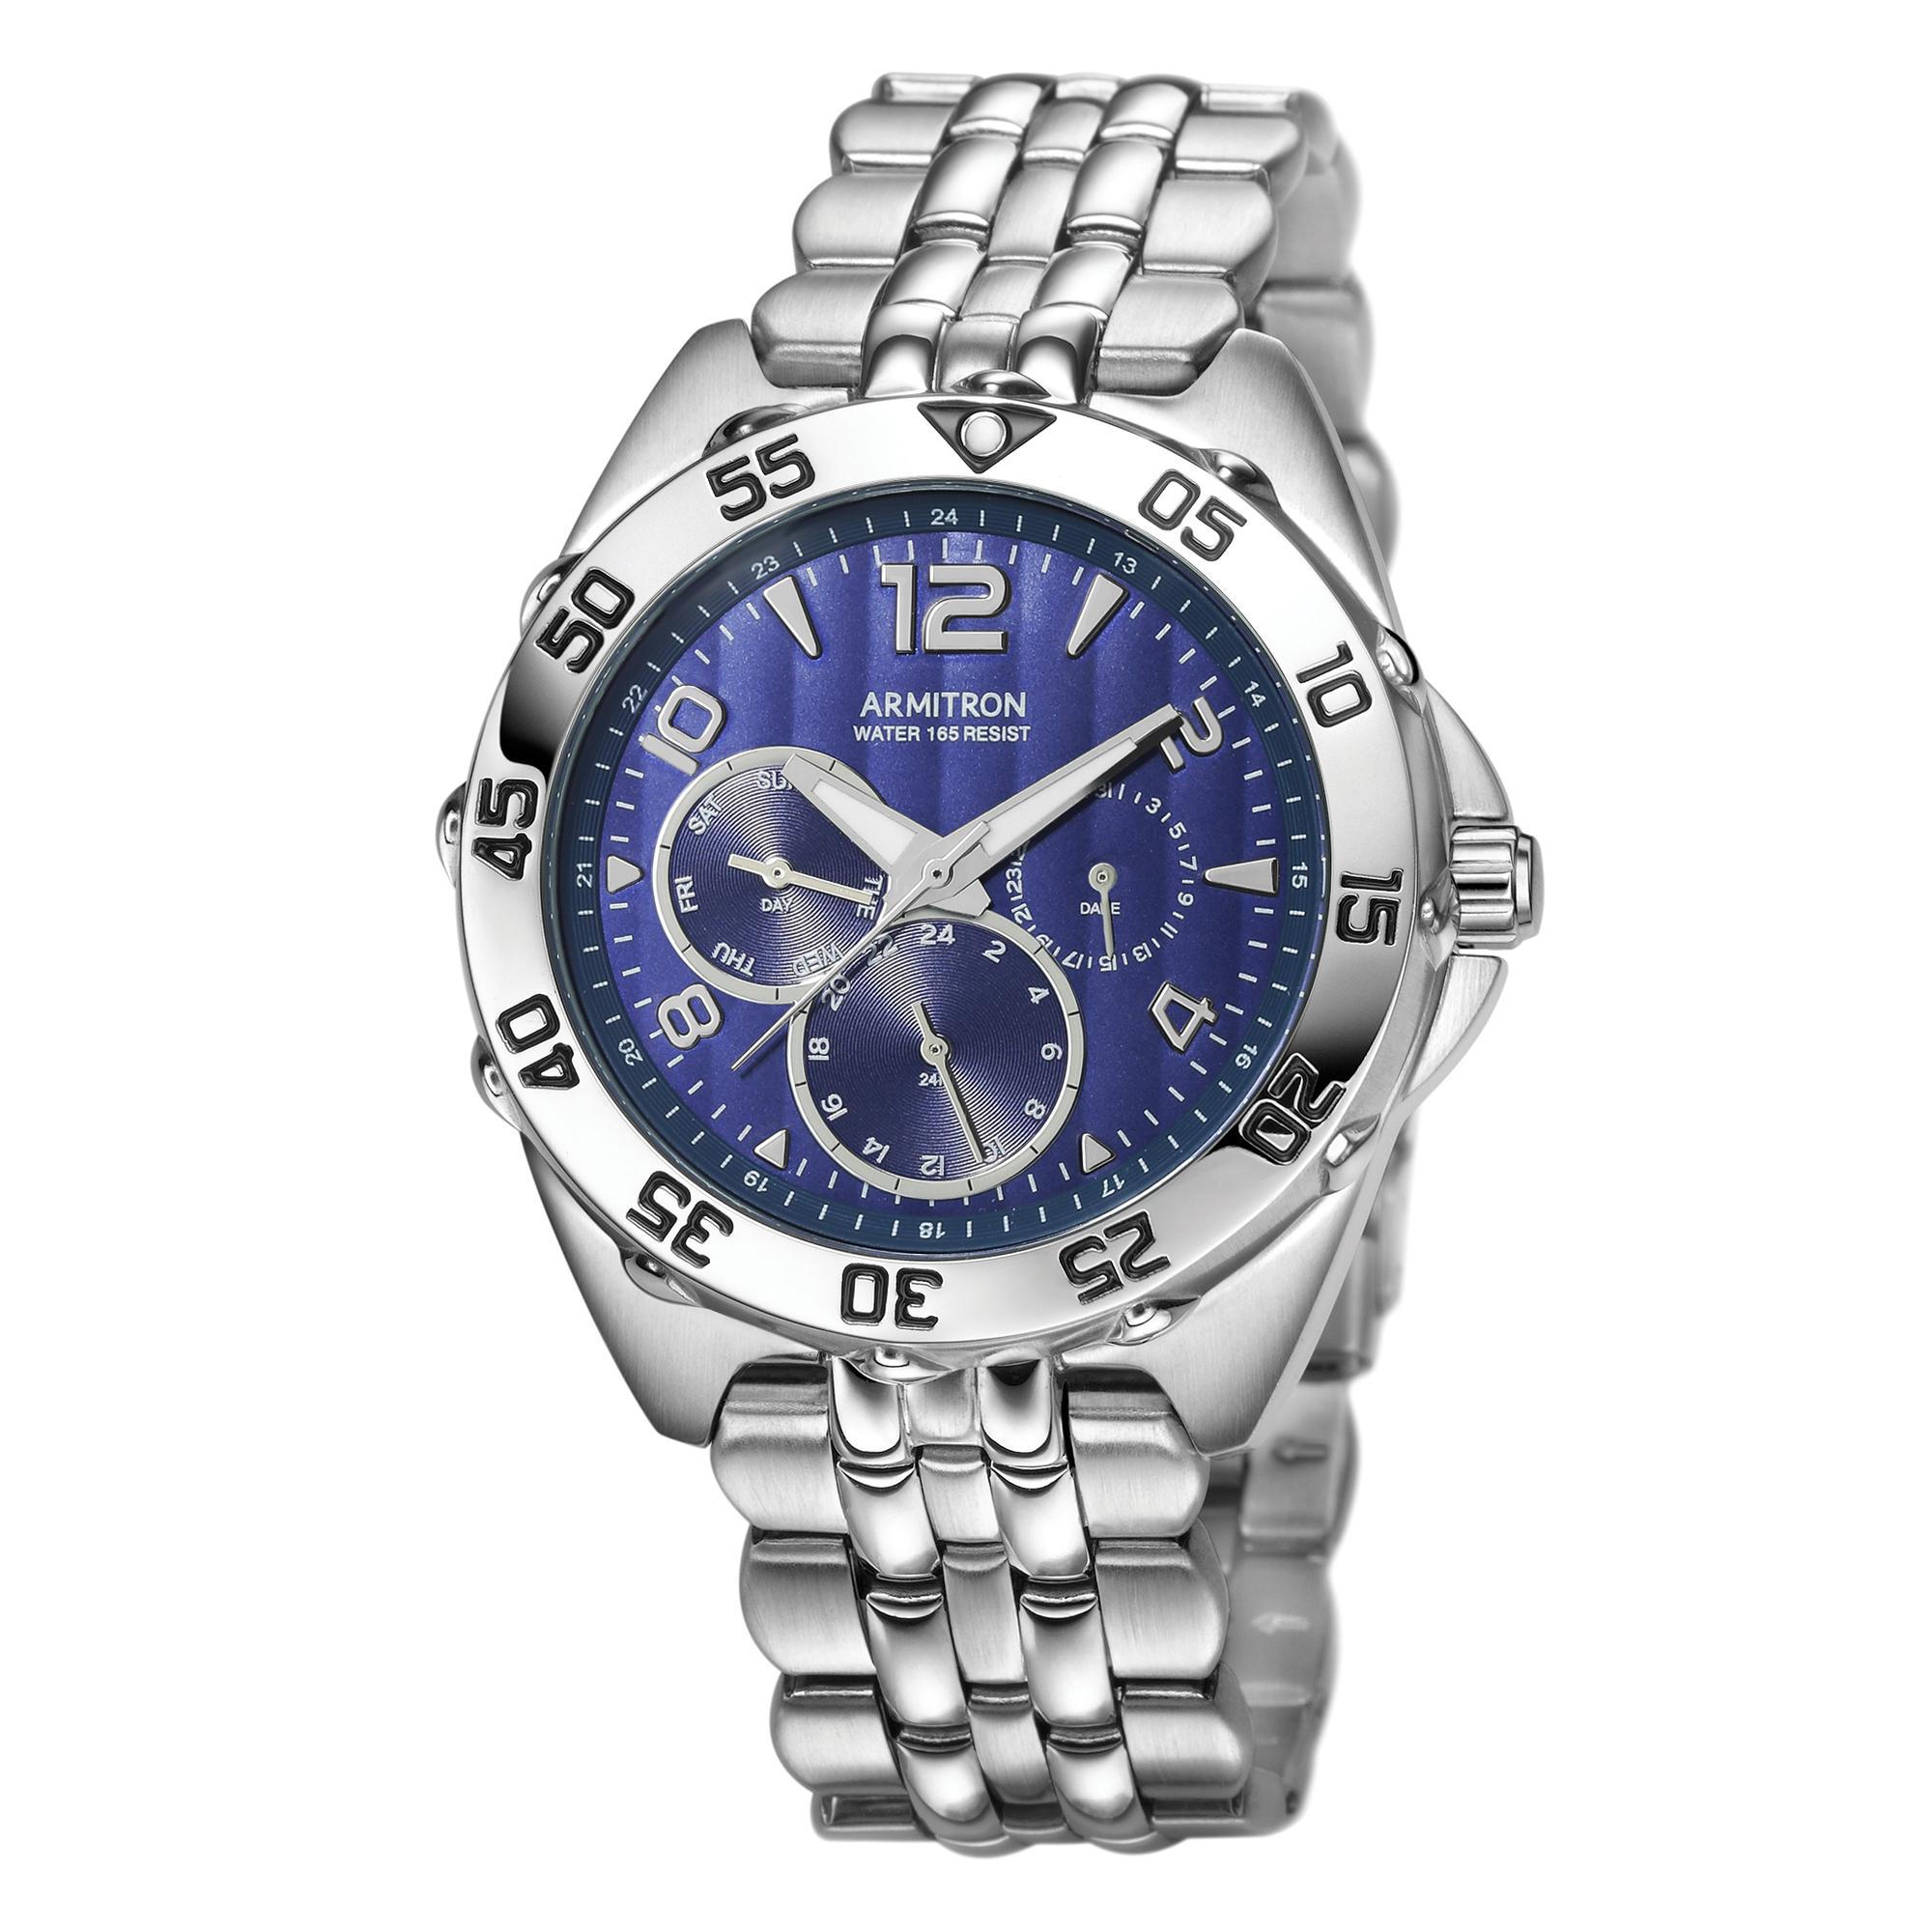 Armitron Men's Stainless Steel Sport Watch, Stainless Steel Bracelet